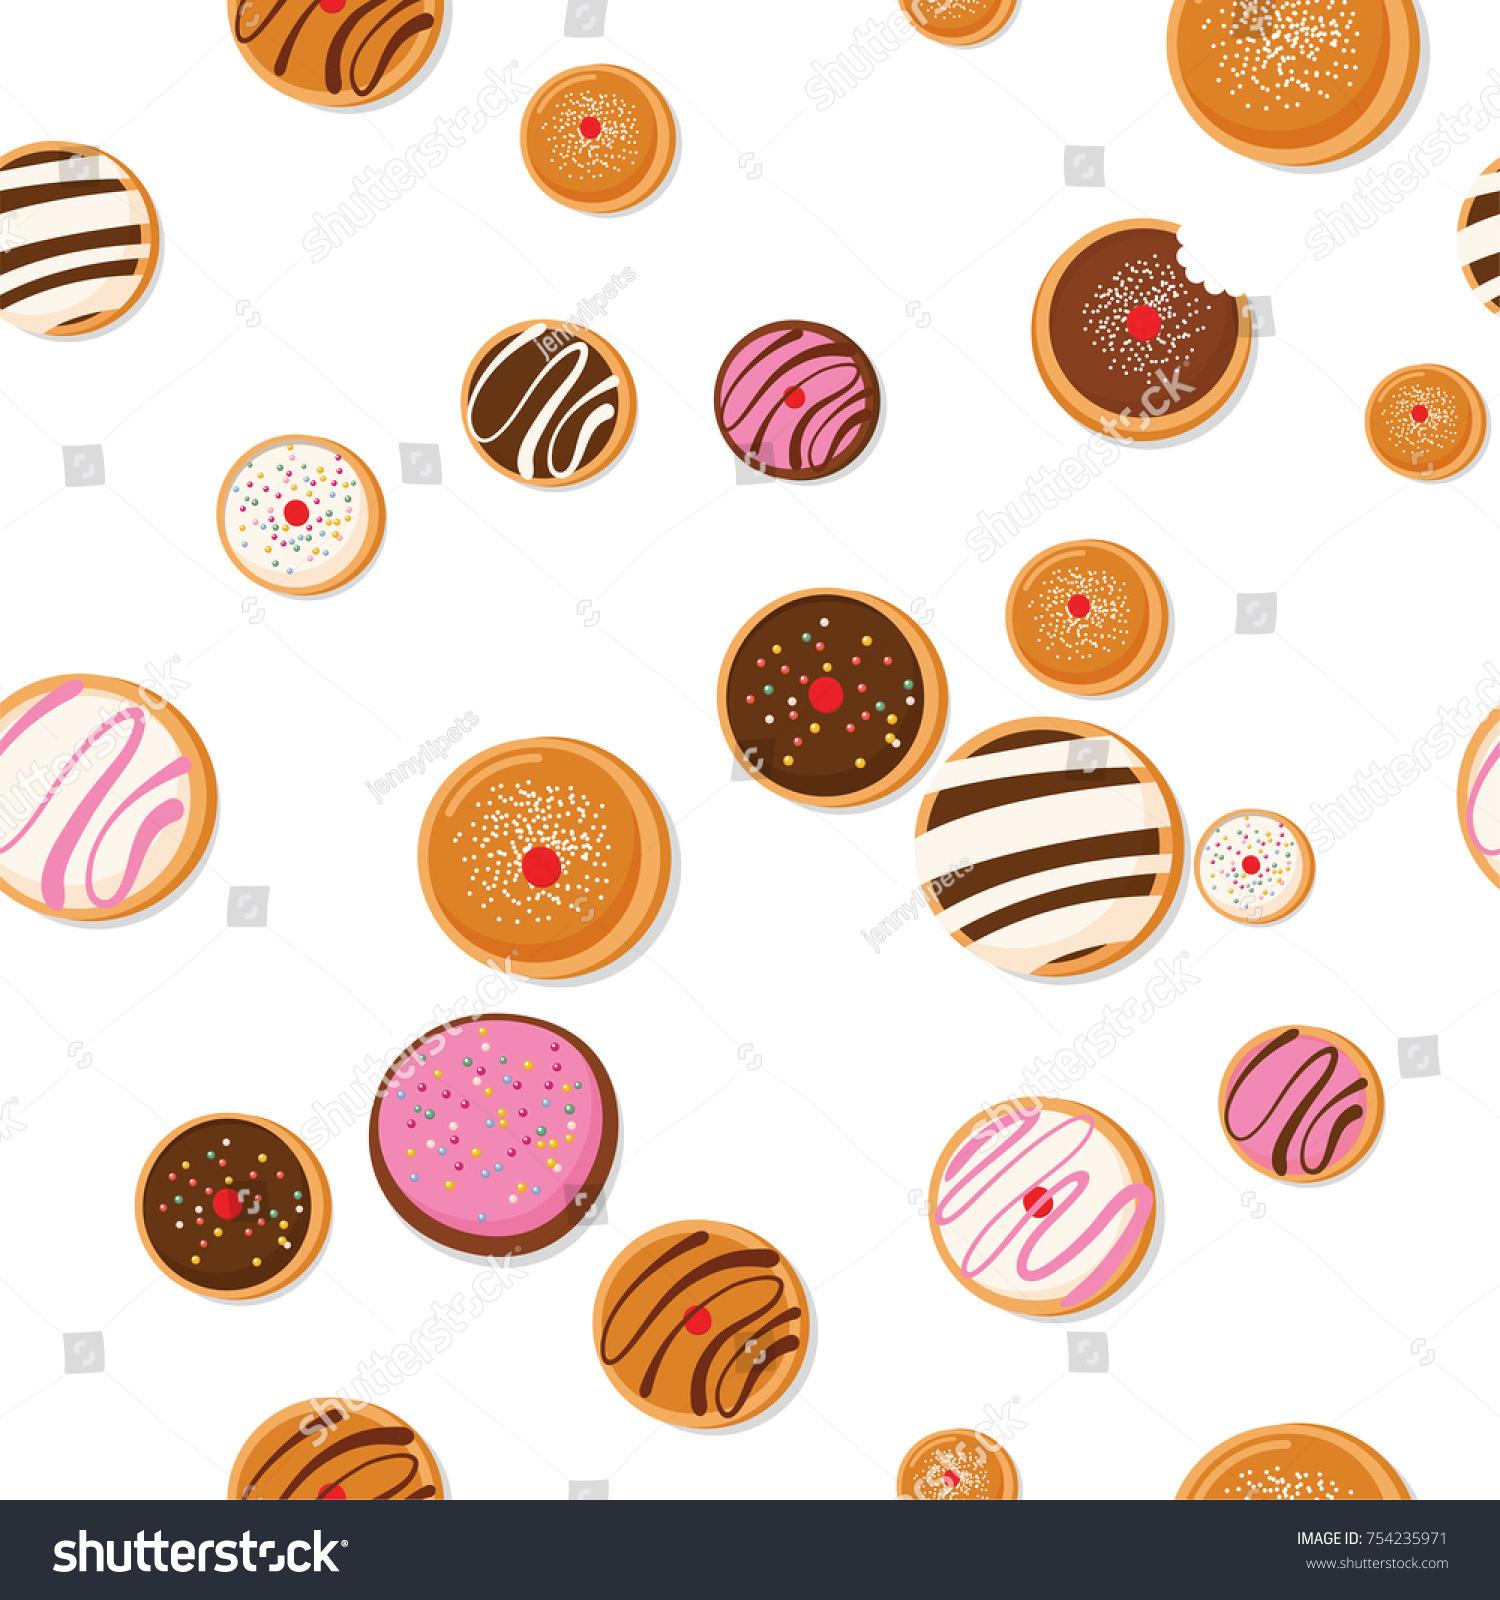 Hanukkah doughnut jewish holiday symbol sweet stock vector 754235971 hanukkah doughnut jewish holiday symbol sweet traditional bake vector illustration greeting card m4hsunfo